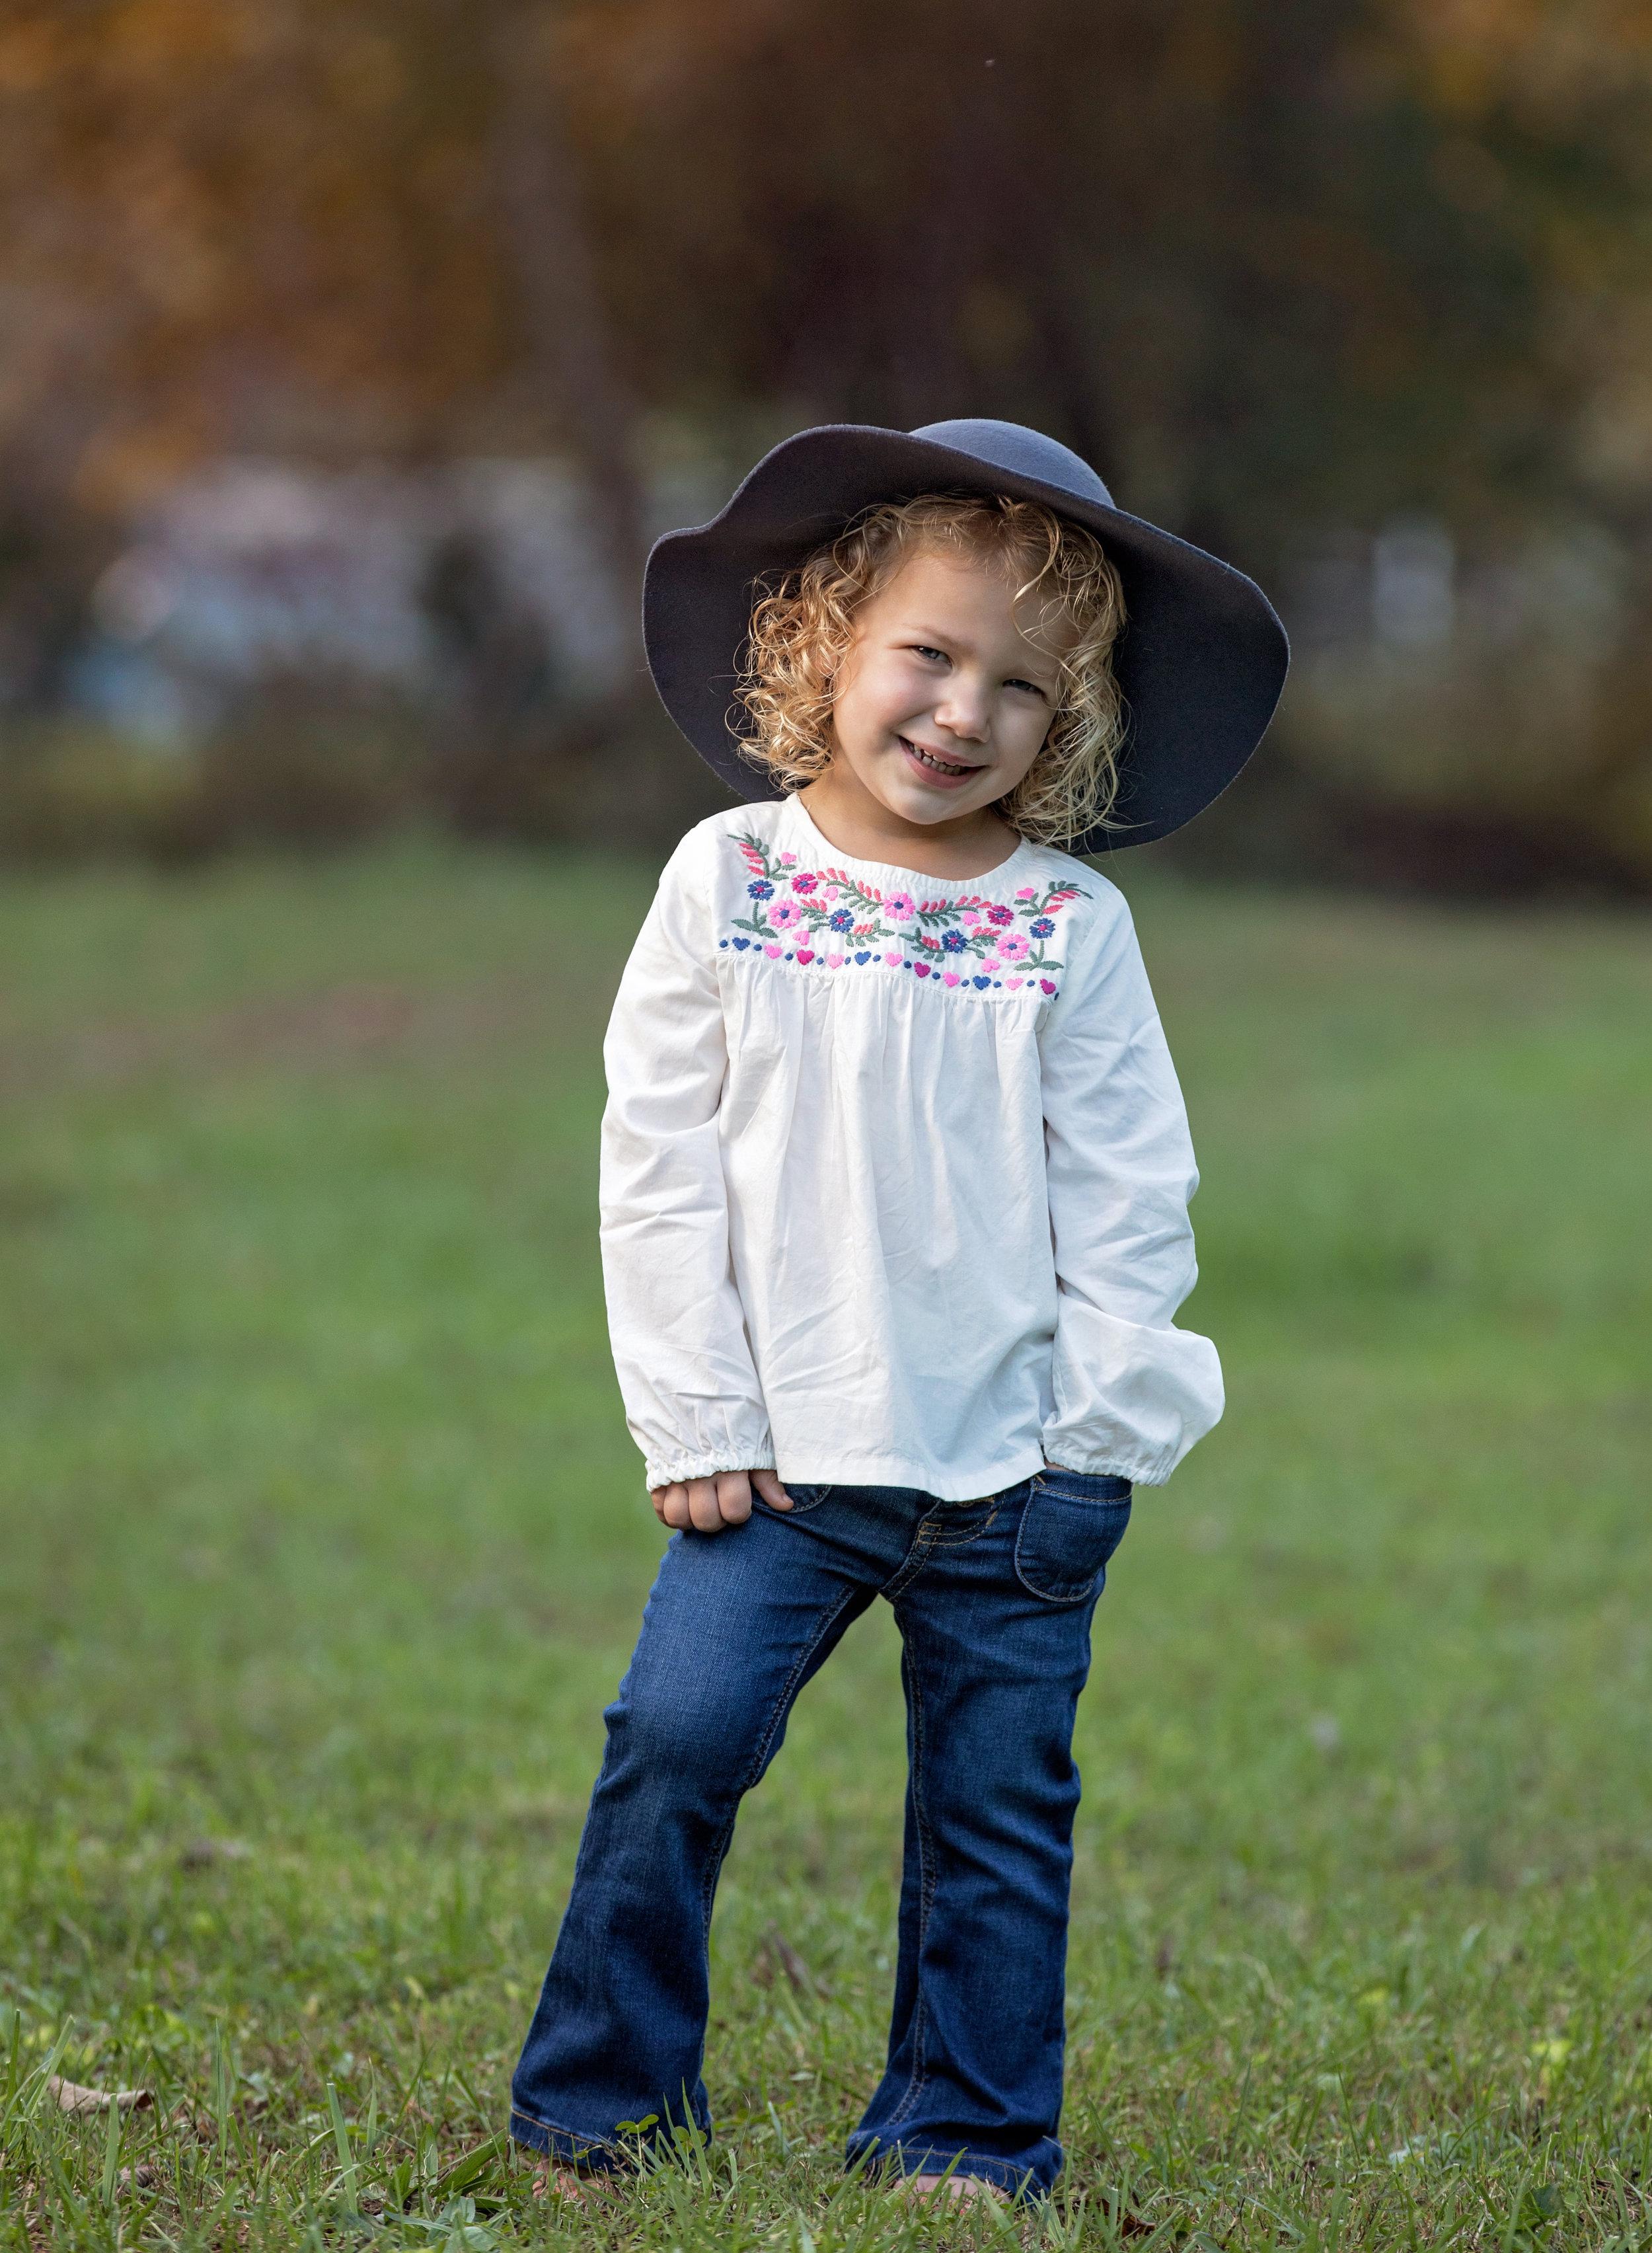 St Louis Childrens Kid Photographer.jpg